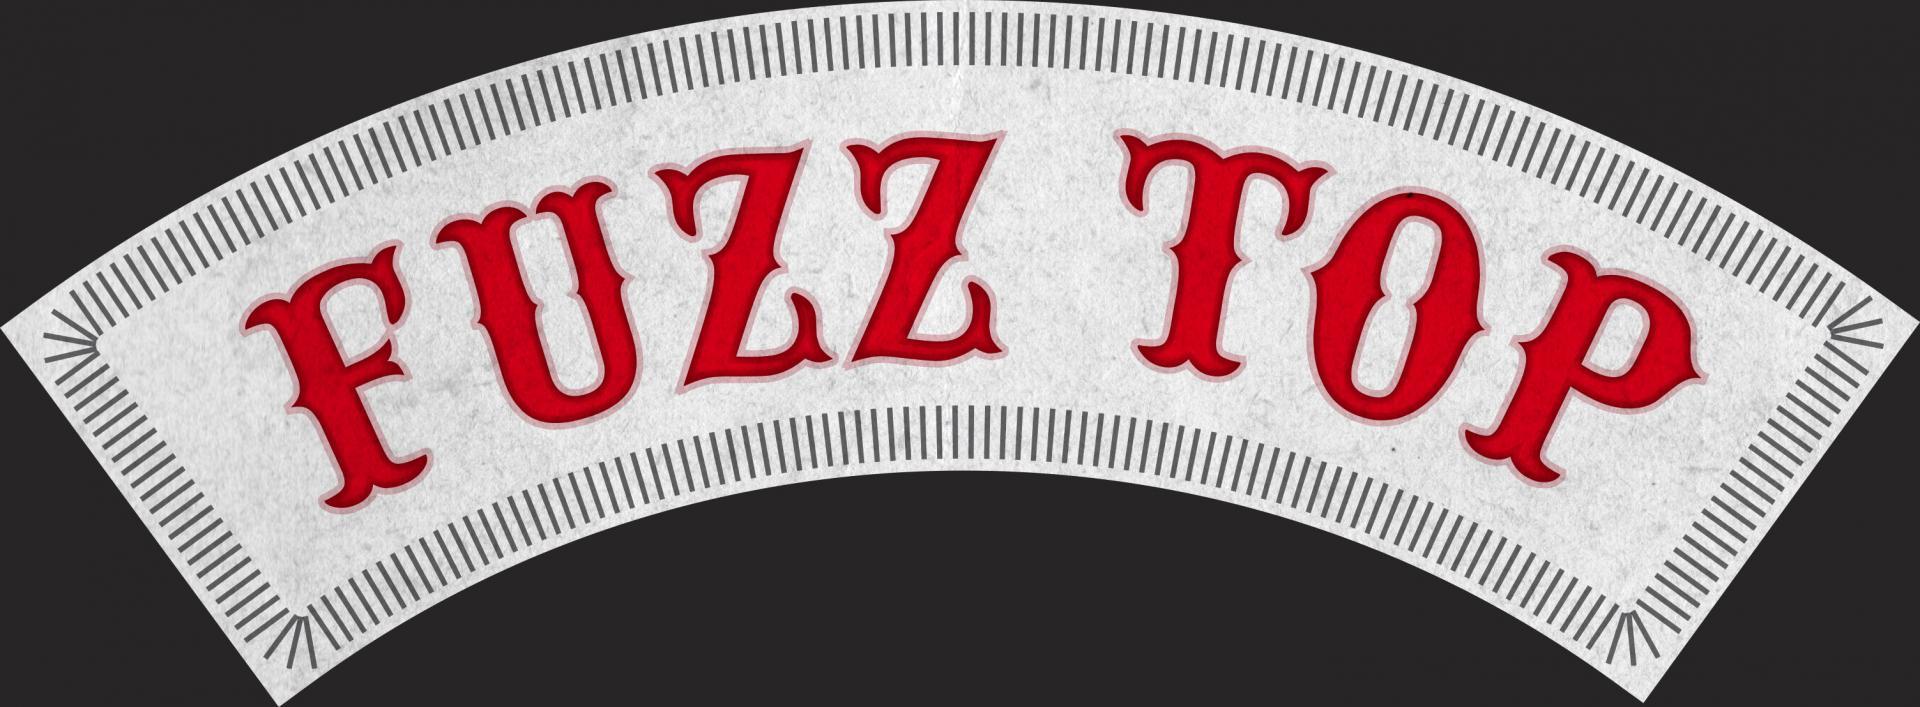 New logo psd fond